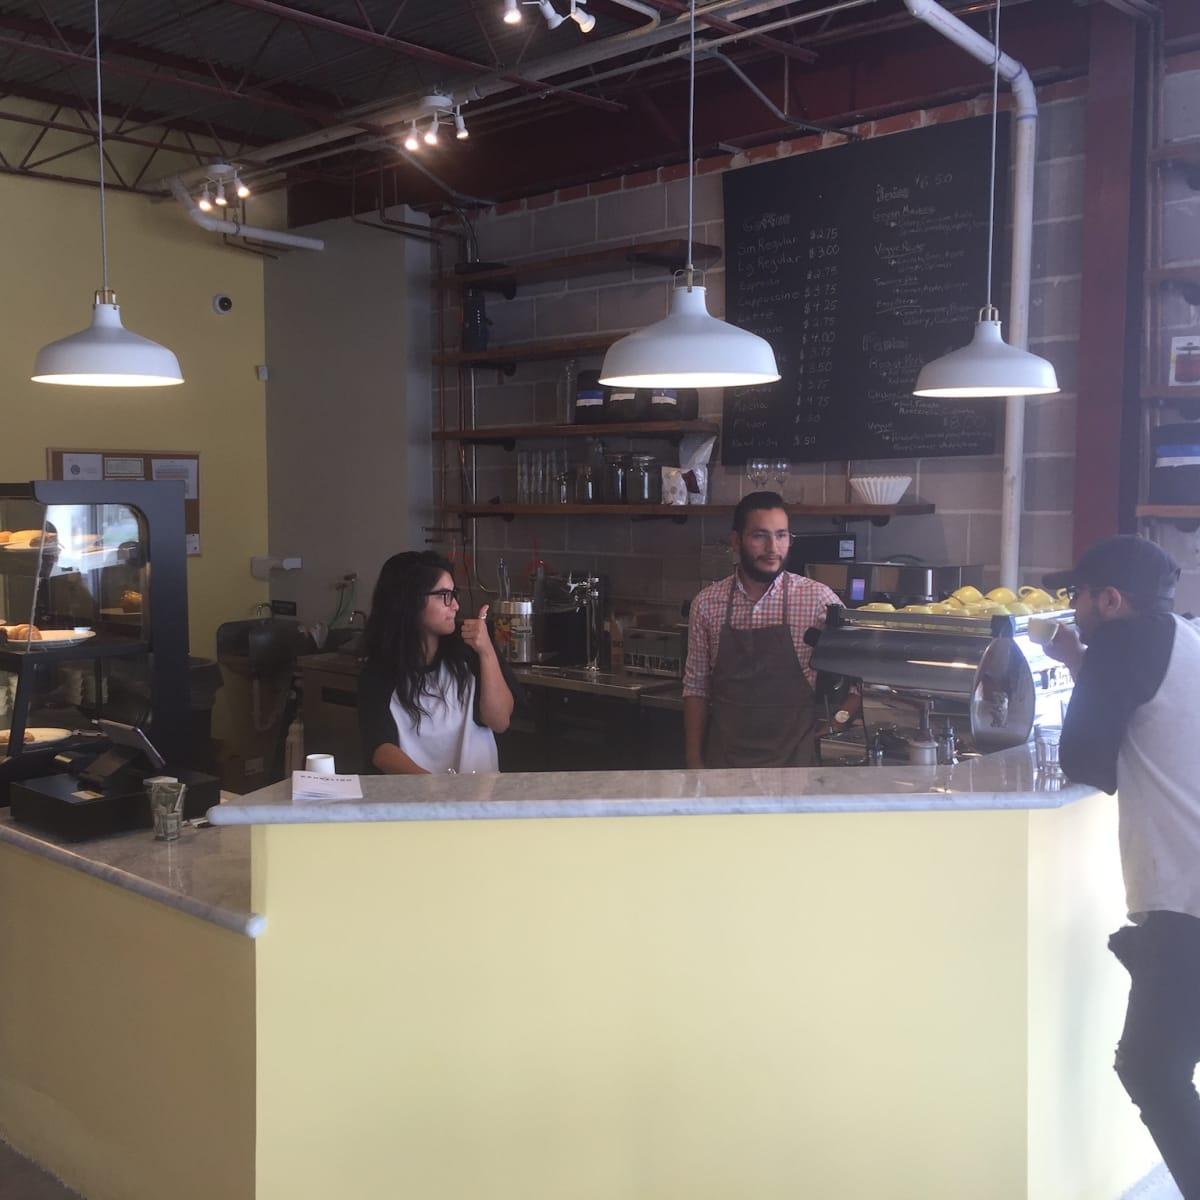 Dandelion Cafe interior